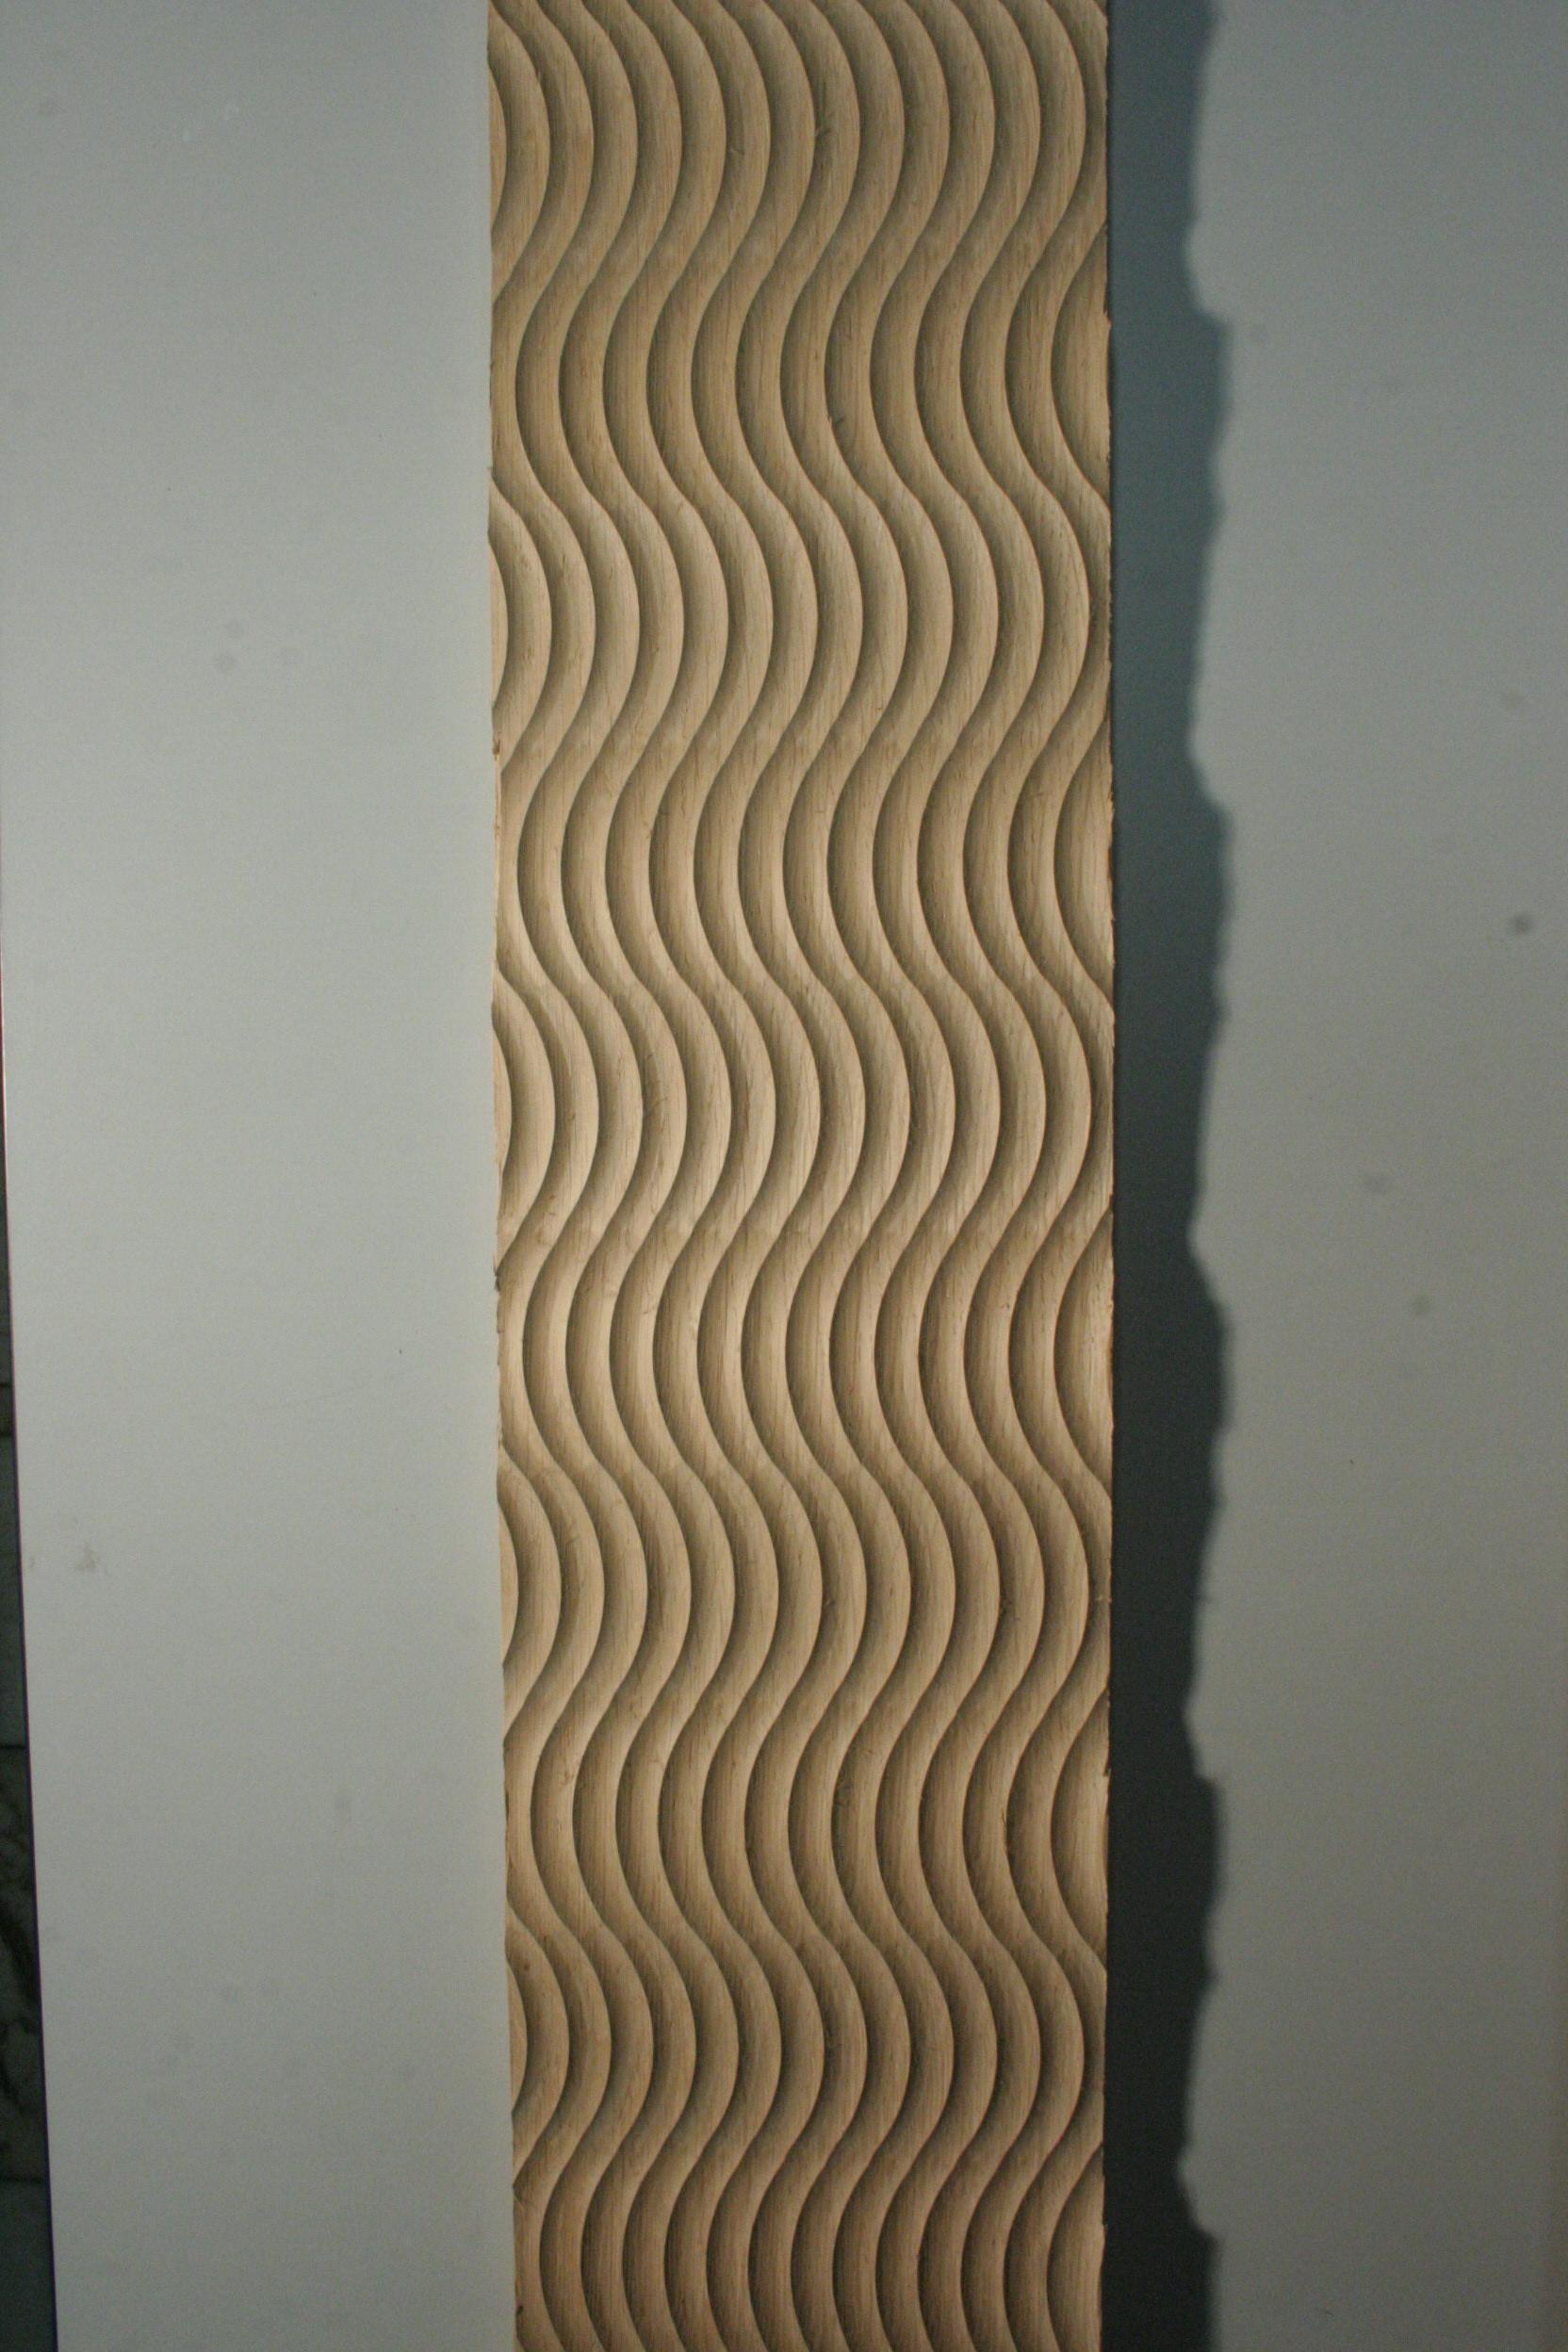 reliefplatten akustikplatten m belwerk l nen. Black Bedroom Furniture Sets. Home Design Ideas